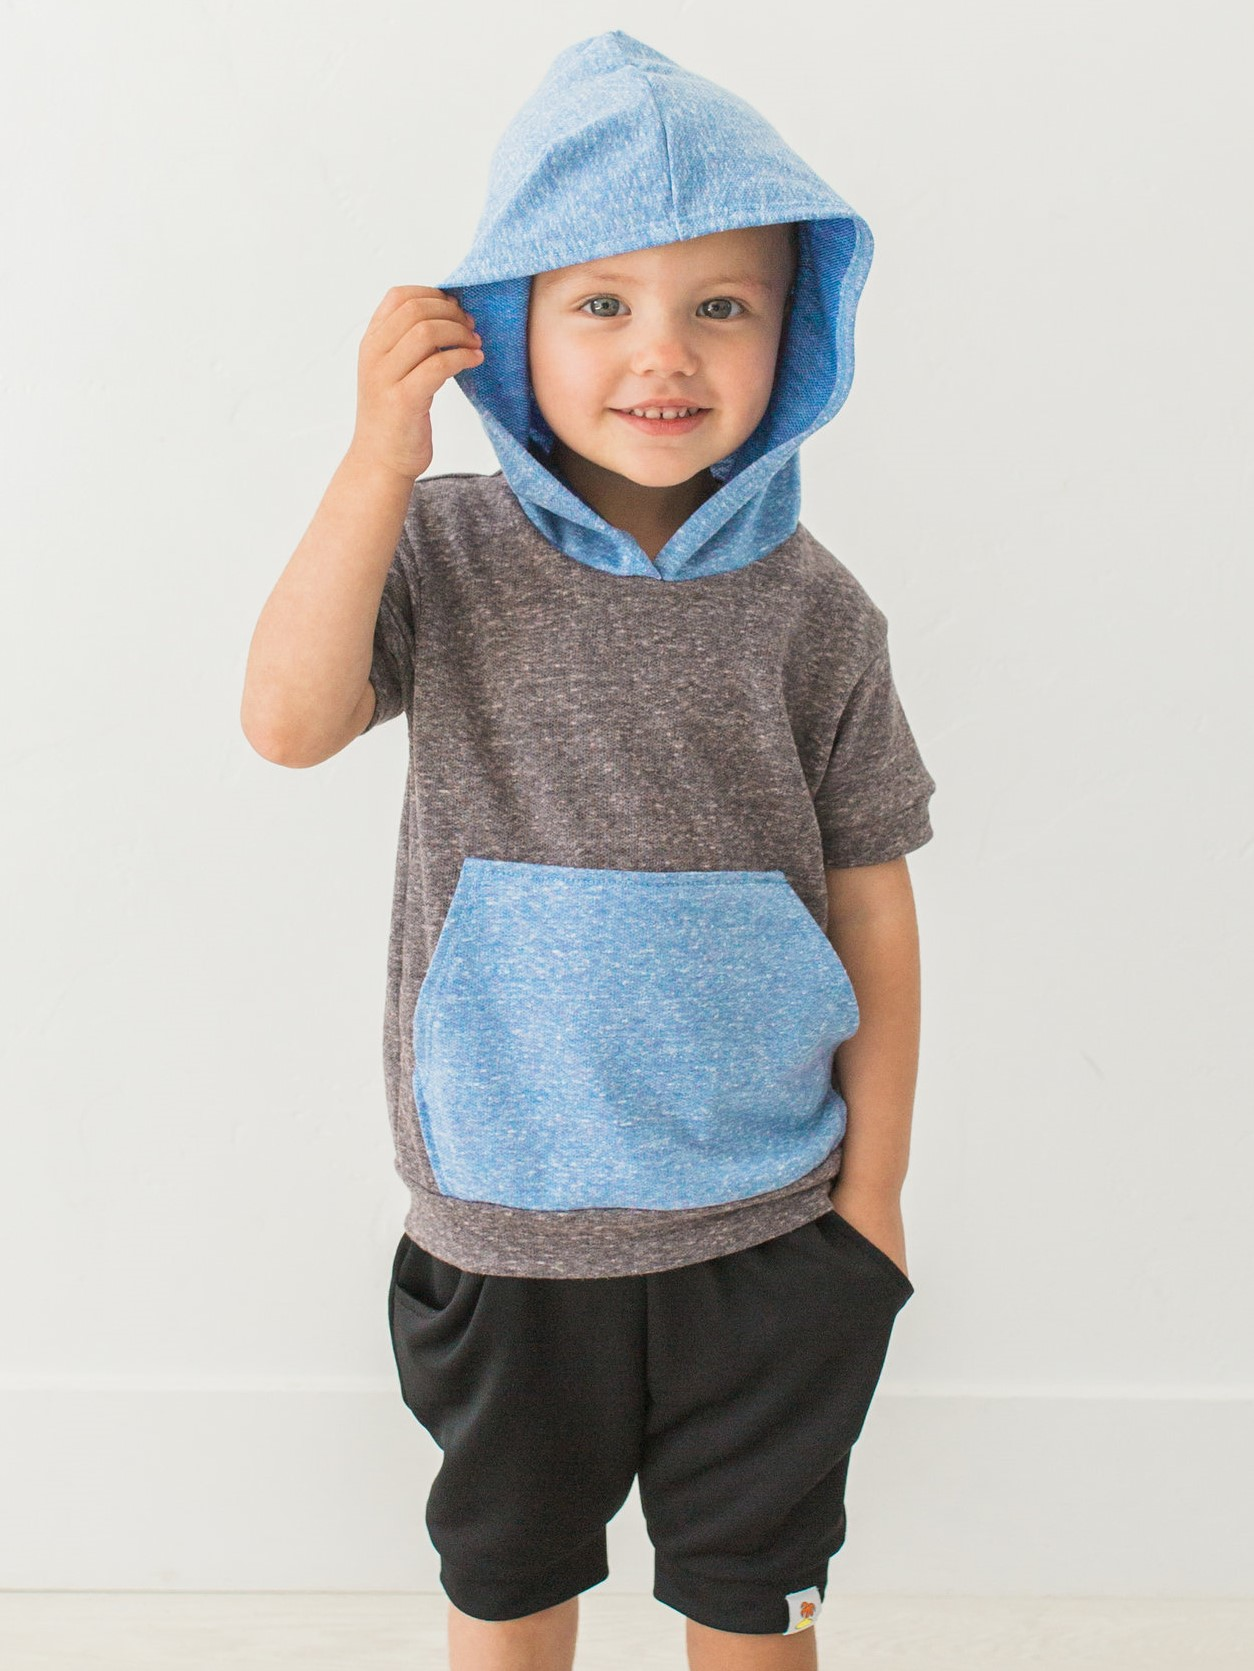 PARADISE KIDS CLOTHING-0234.jpg